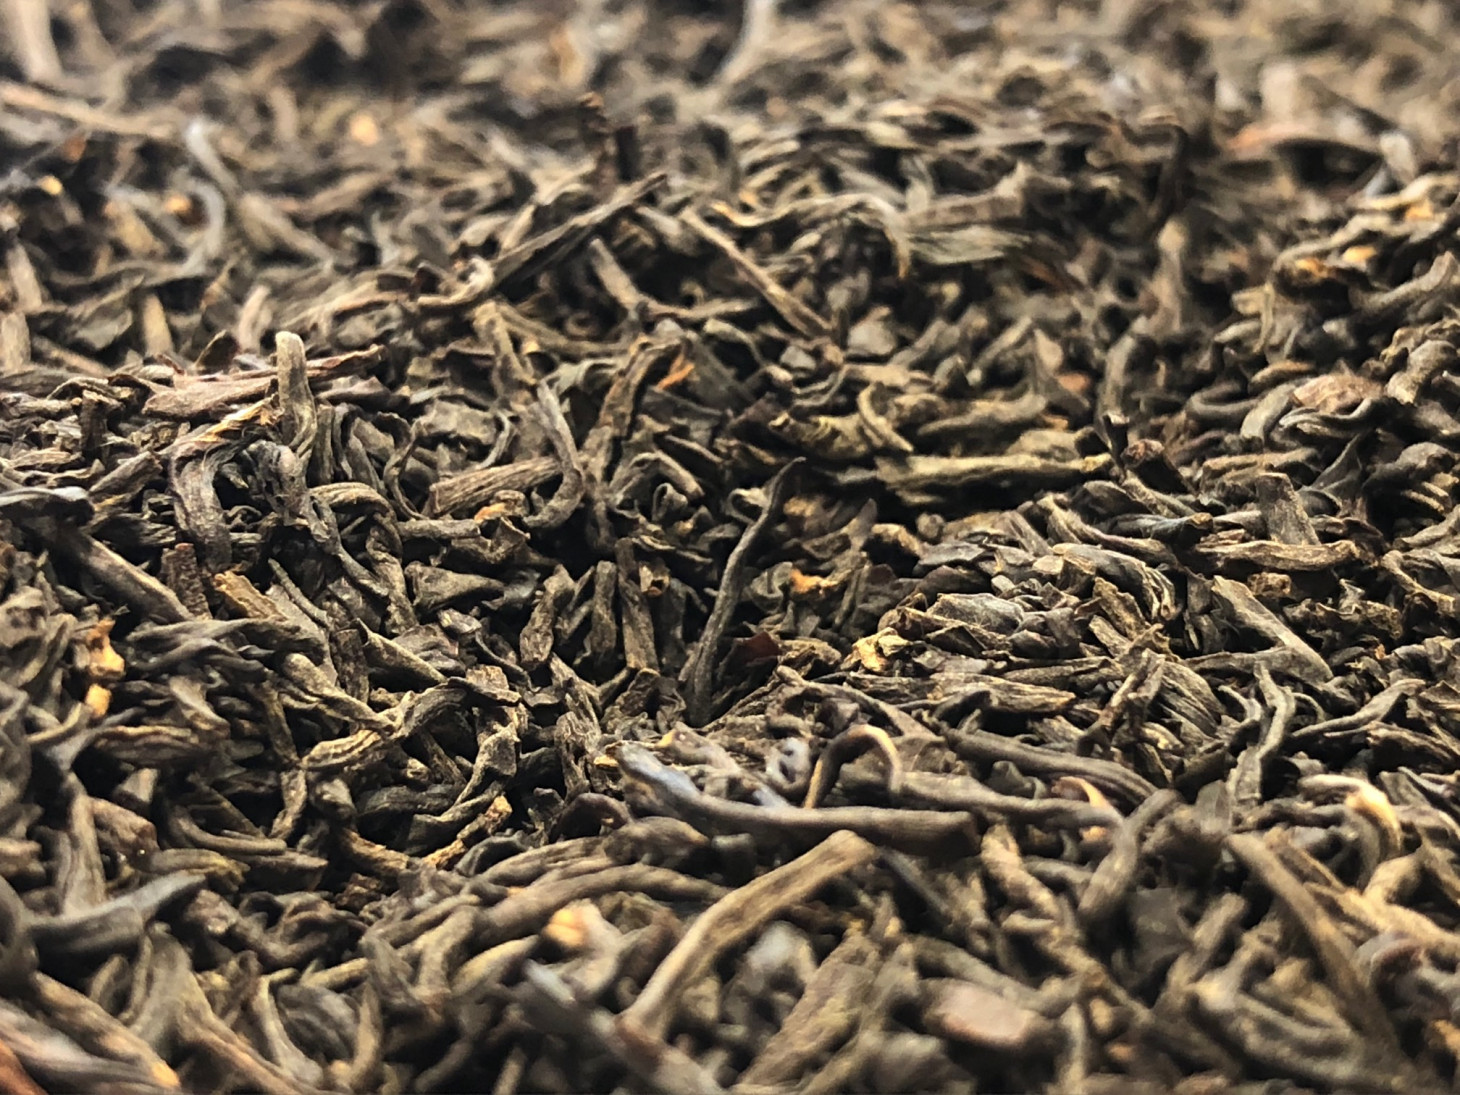 thé noir chine grand jardin keemun tao ya tea & cie commander du thé acheter en ligne vannes